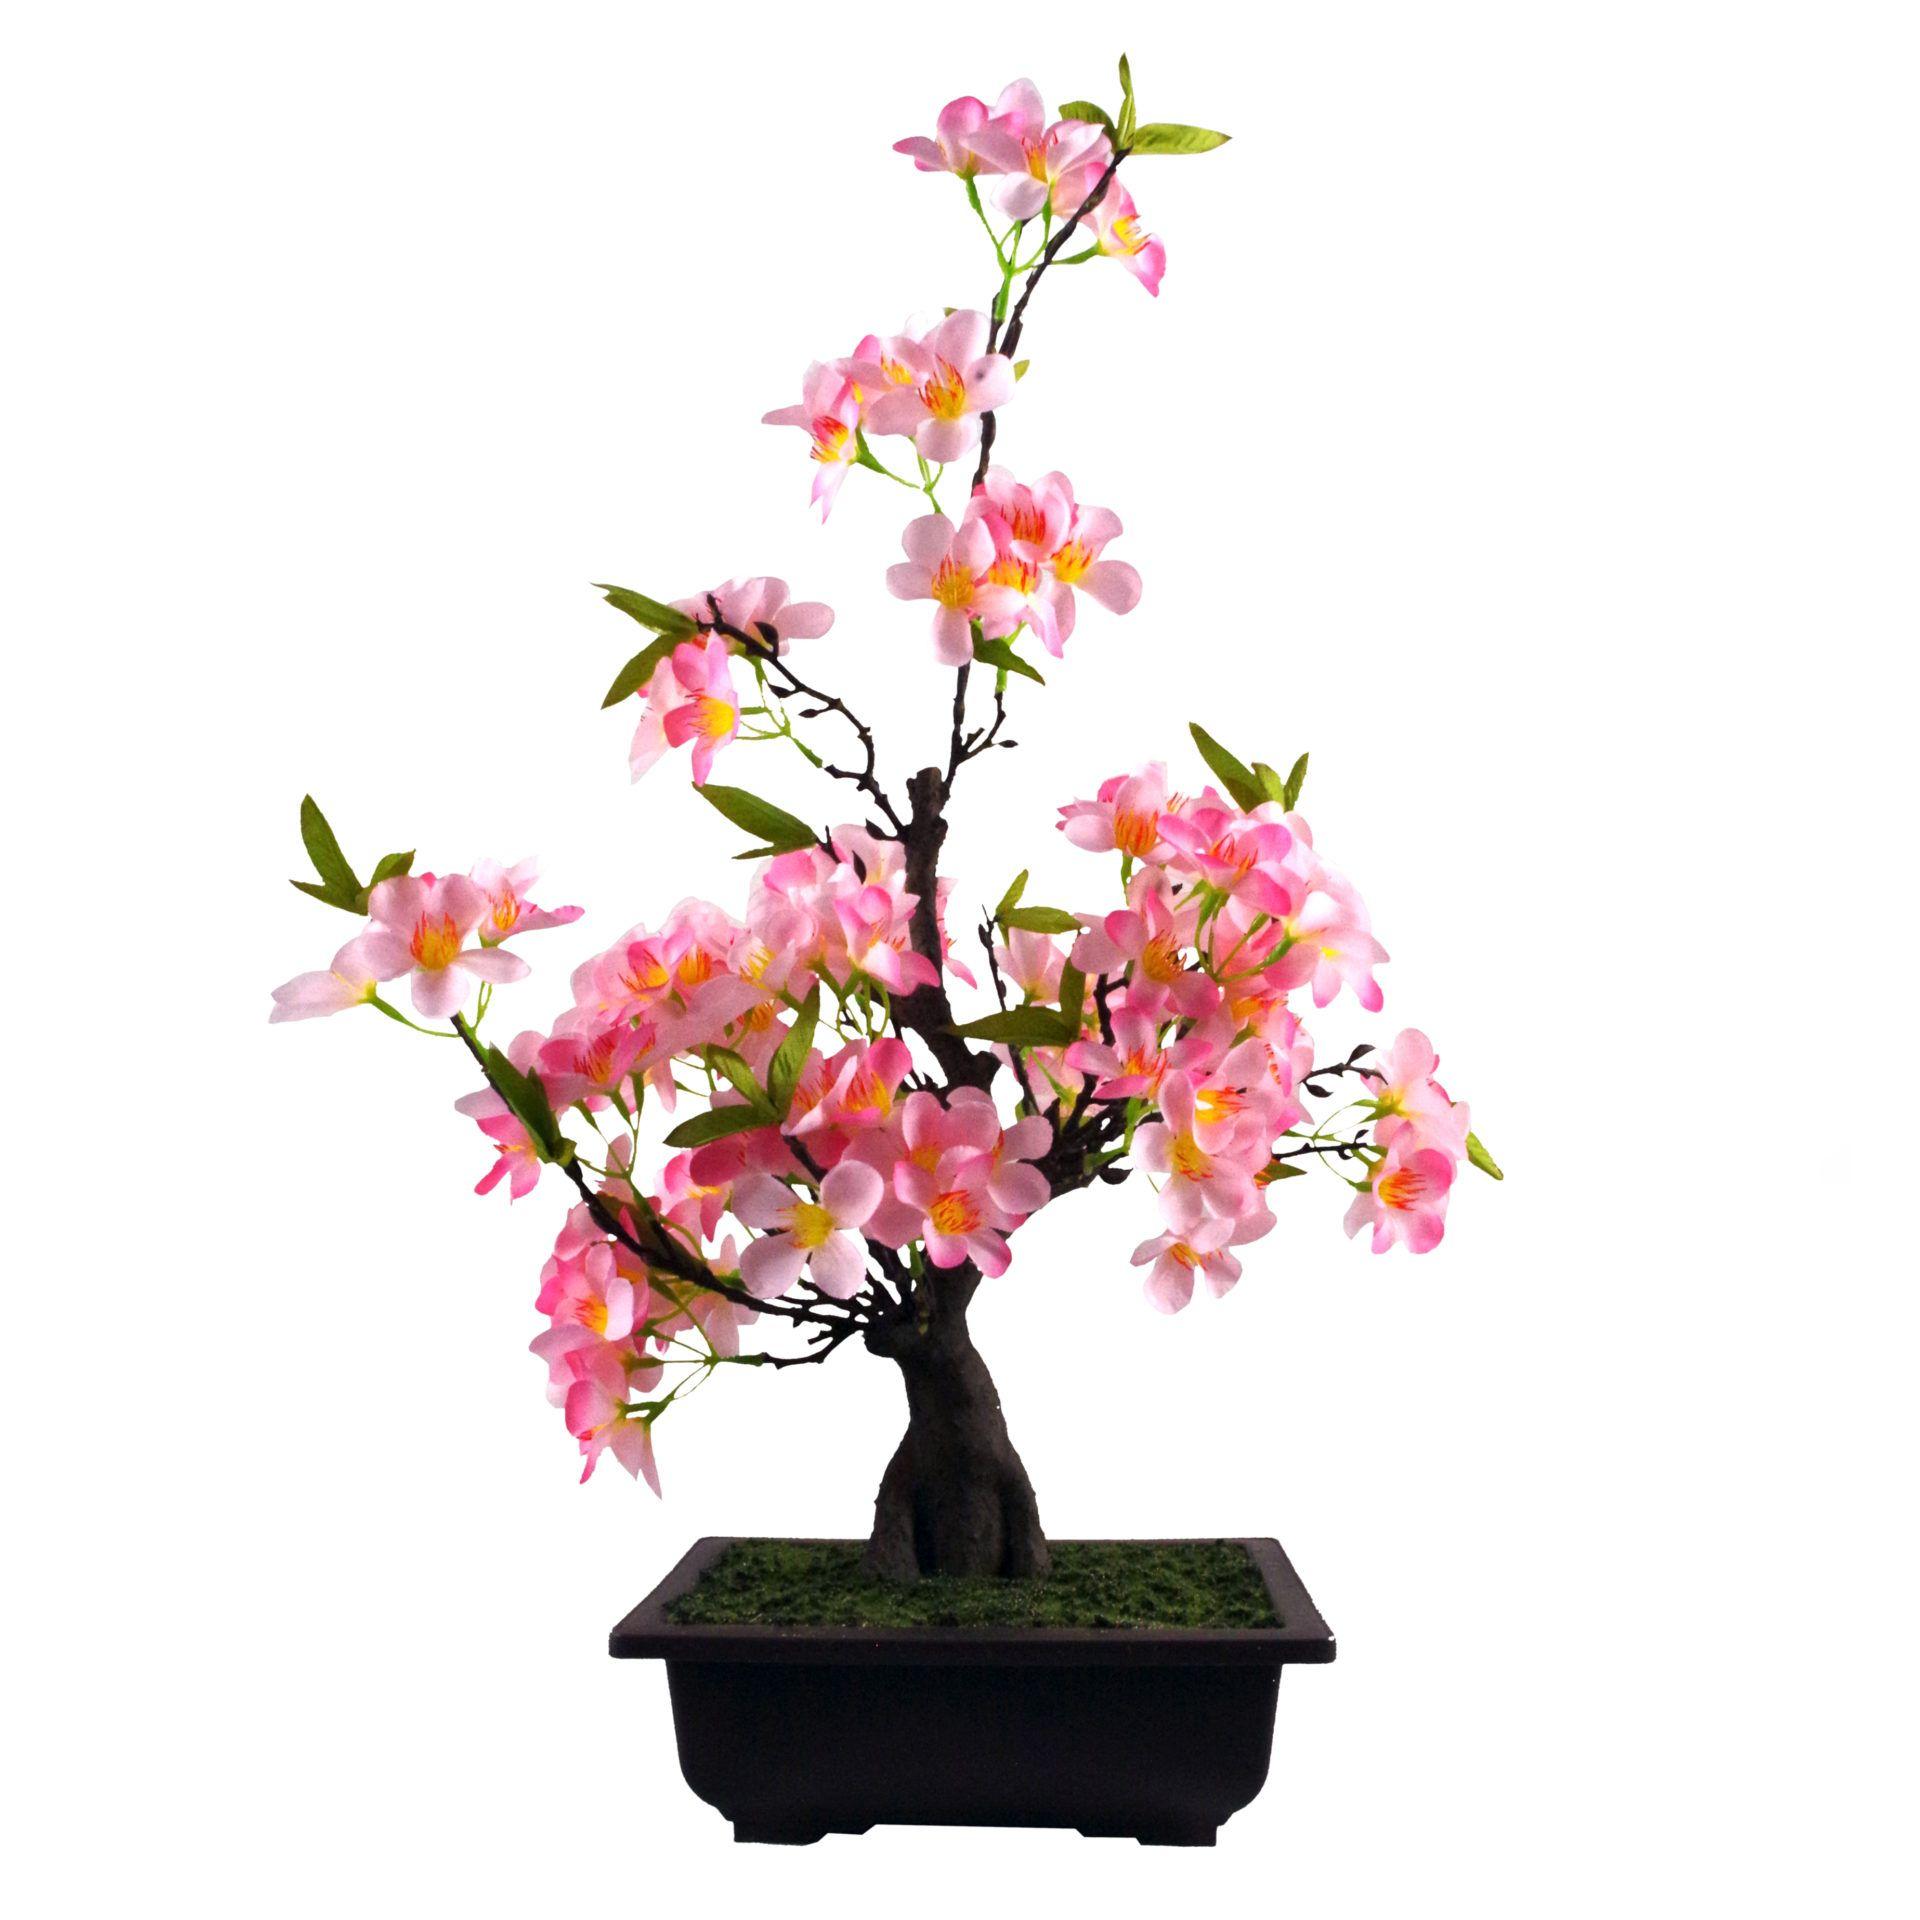 60cm Artificial Pink Blossom Bonsai Tree Artificial Cherry Blossom Tree Bonsai Tree Pink Blossom